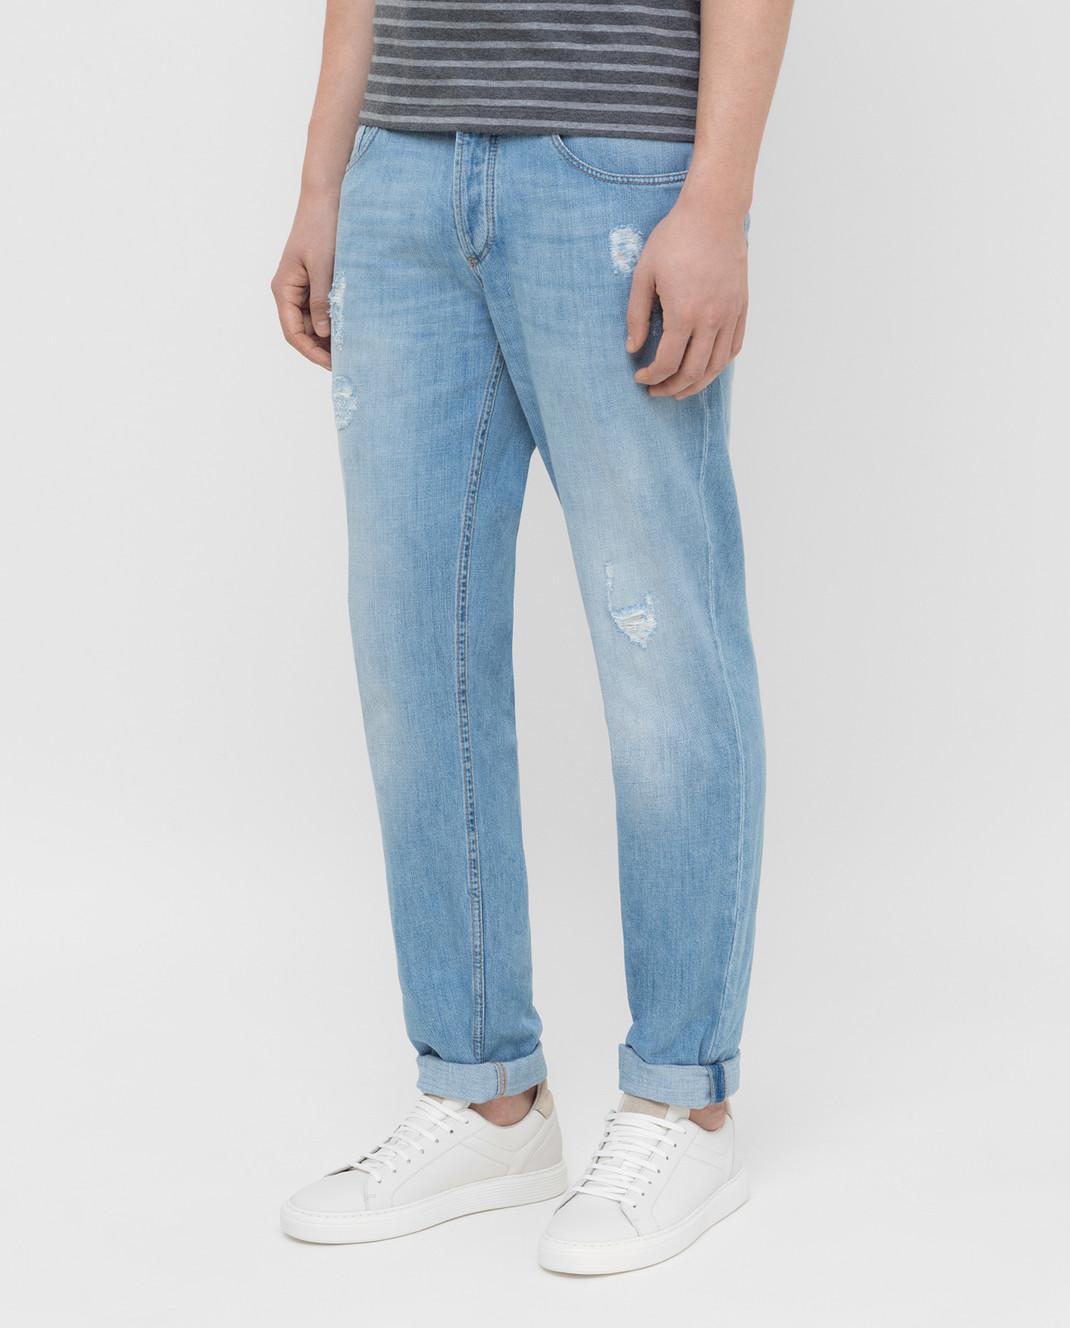 Brunello Cucinelli Голубые джинсы M0Z37D2360 изображение 3